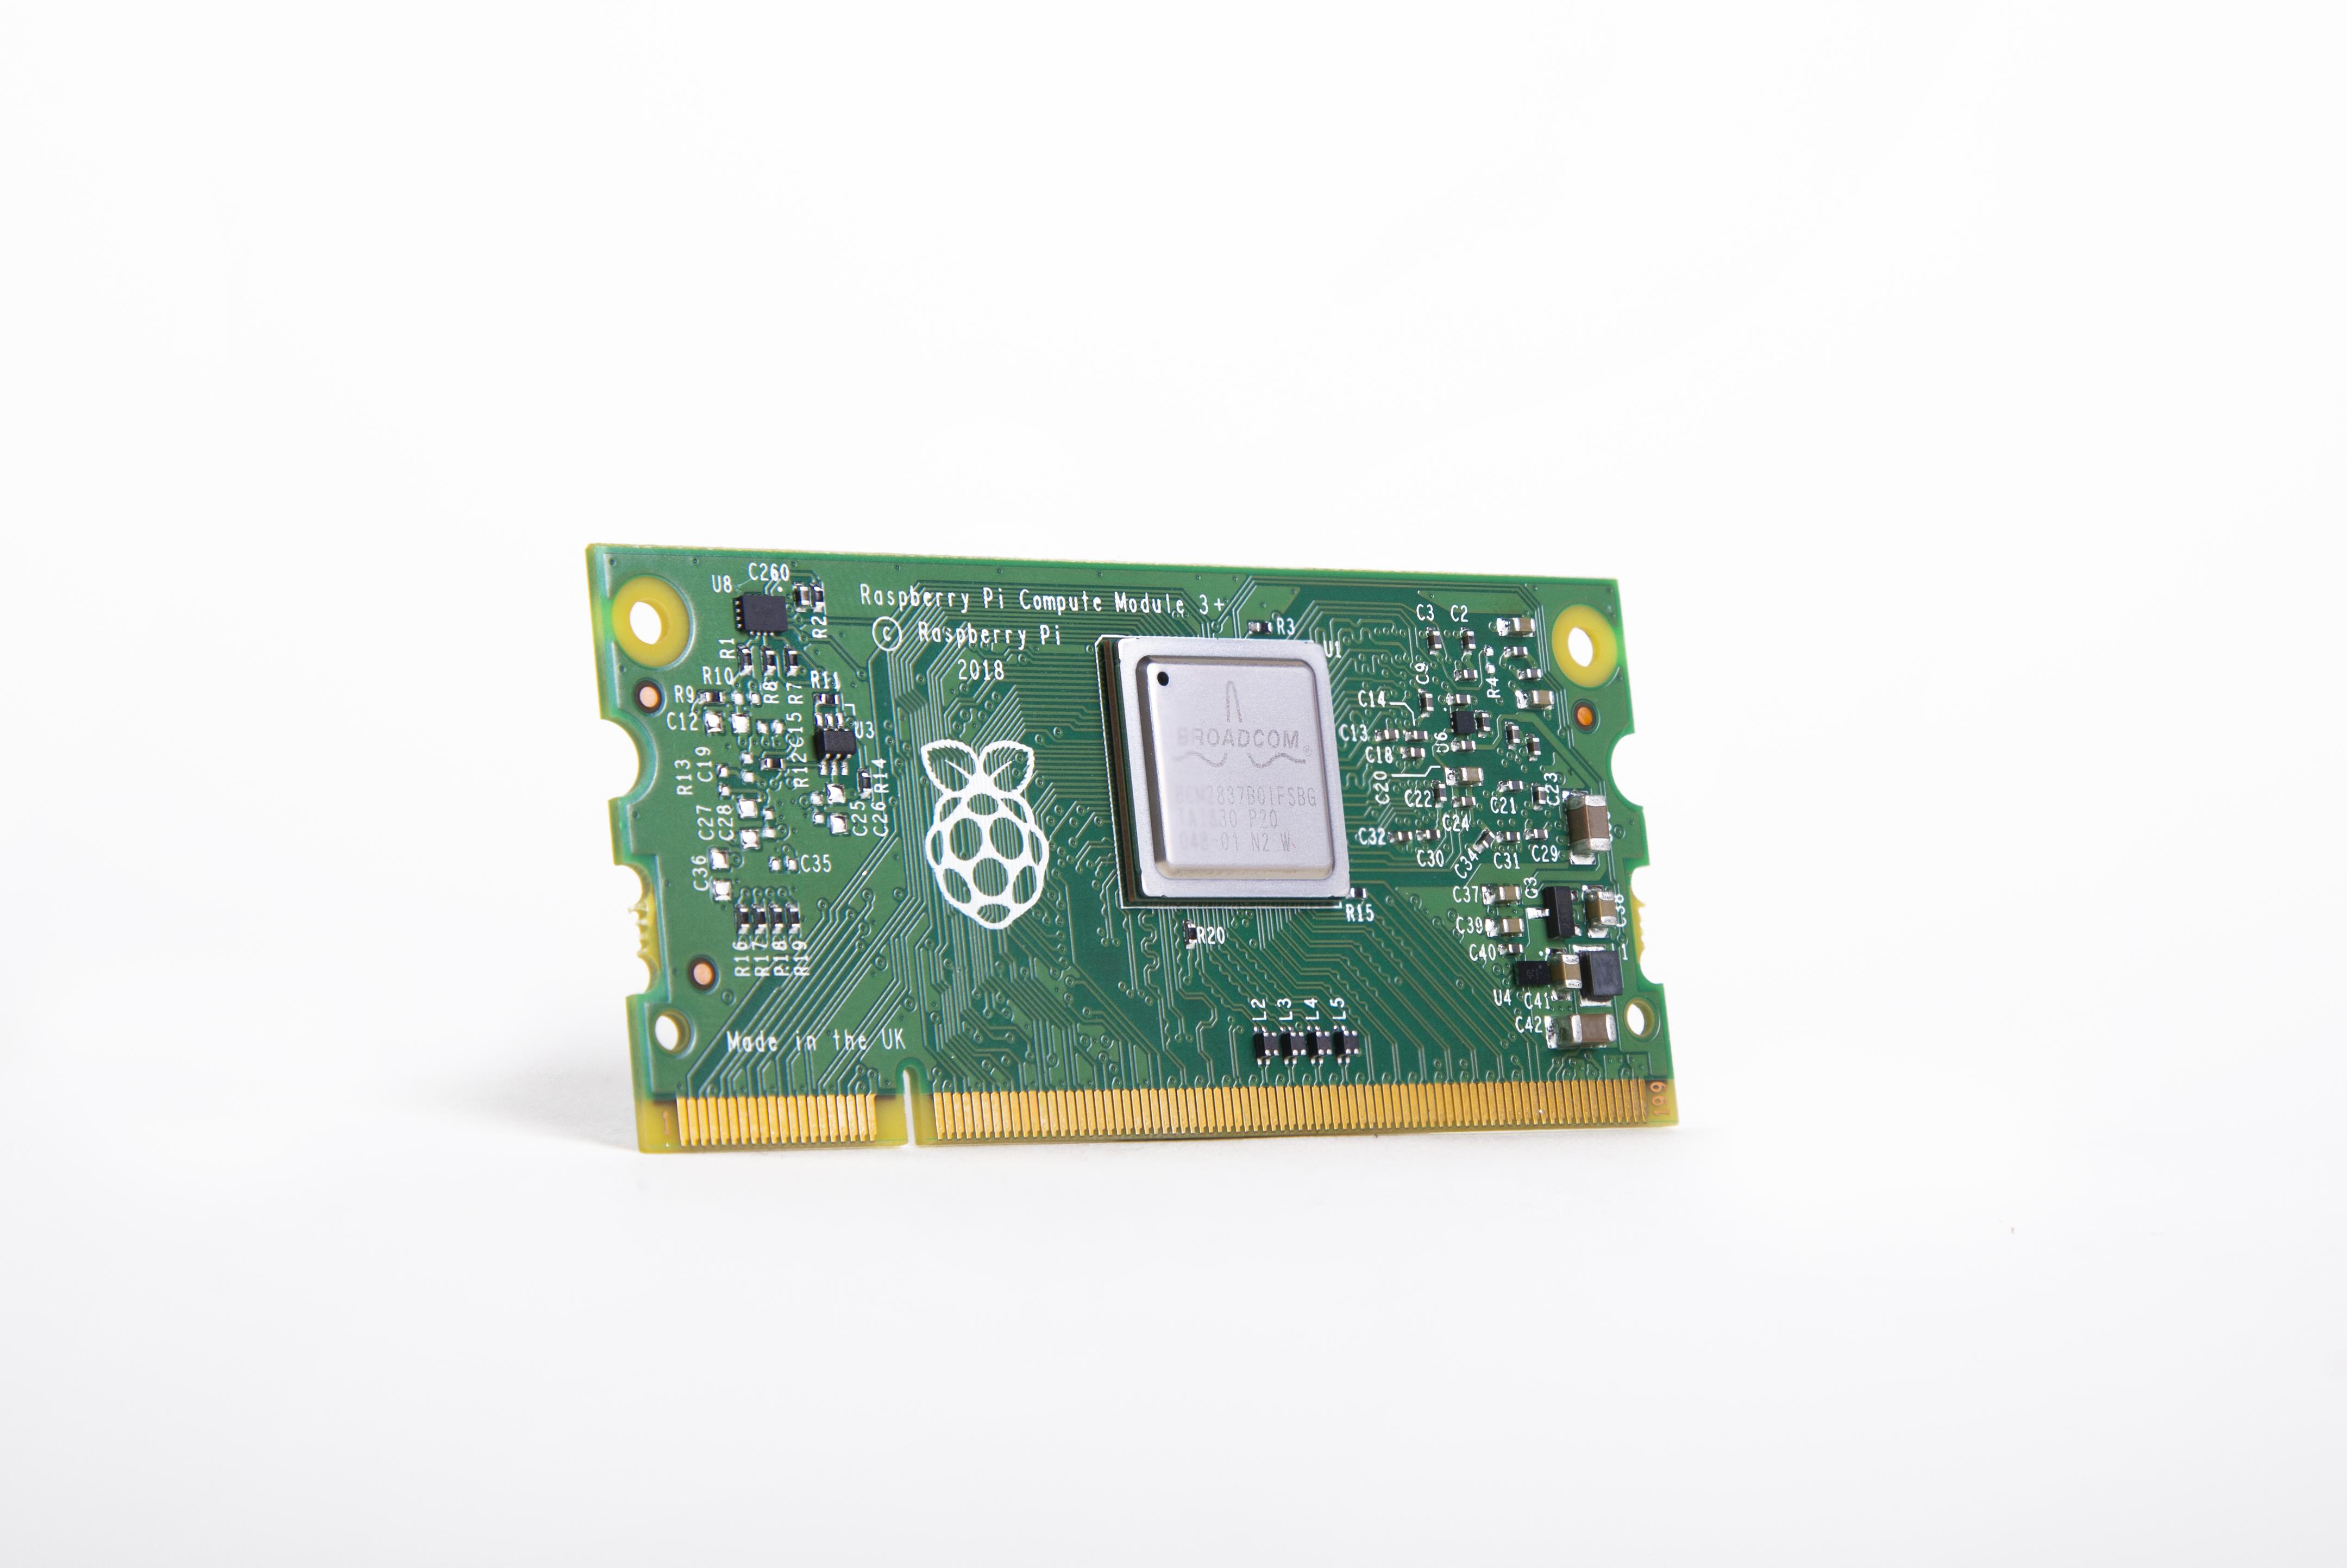 RASPBERRY PI COMPUTE MODULE 3+ 16 GB